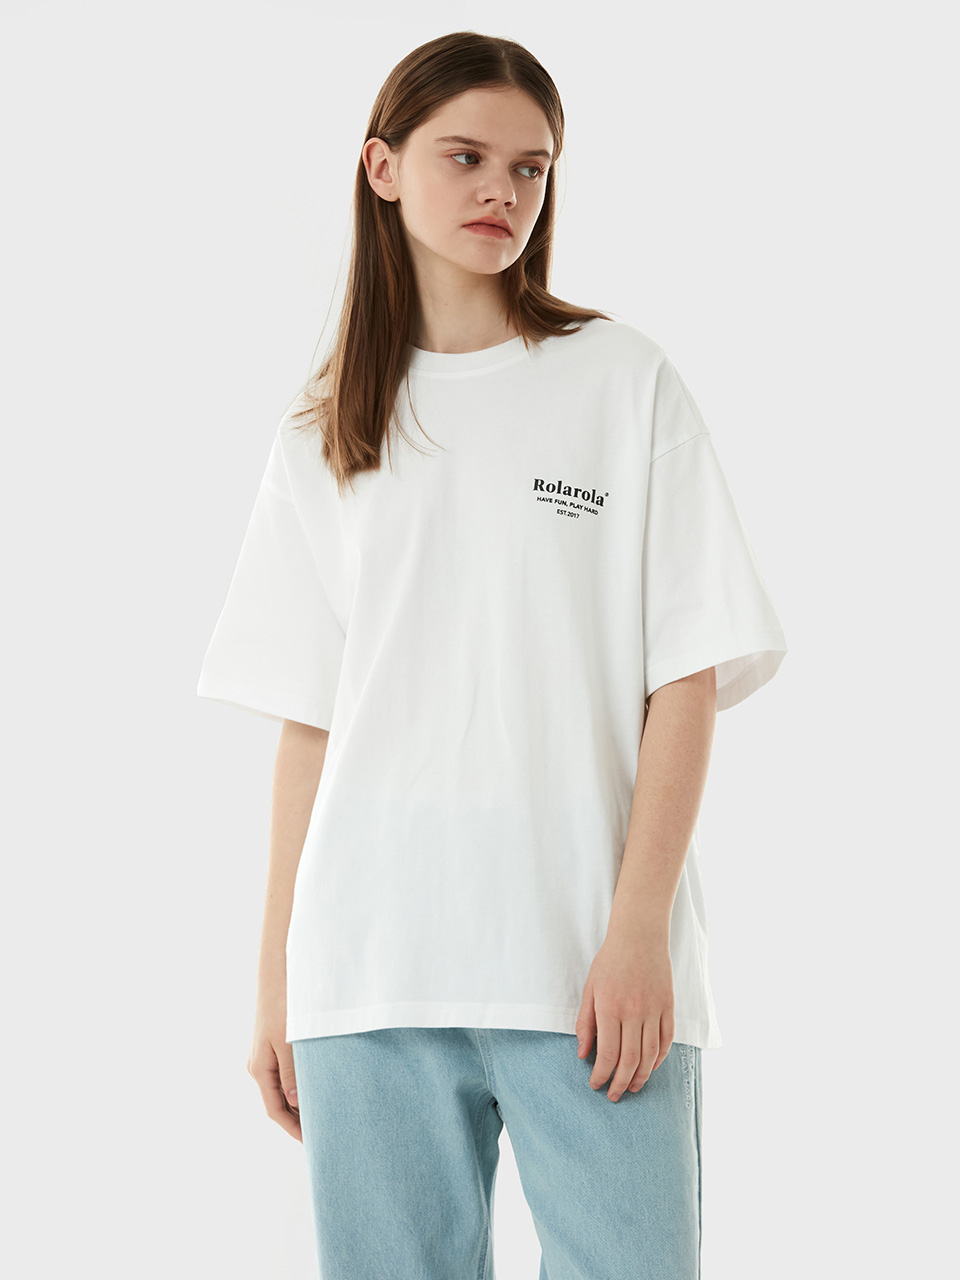 (TS-21302) SMALL LOGO T-SHIRT WHITE